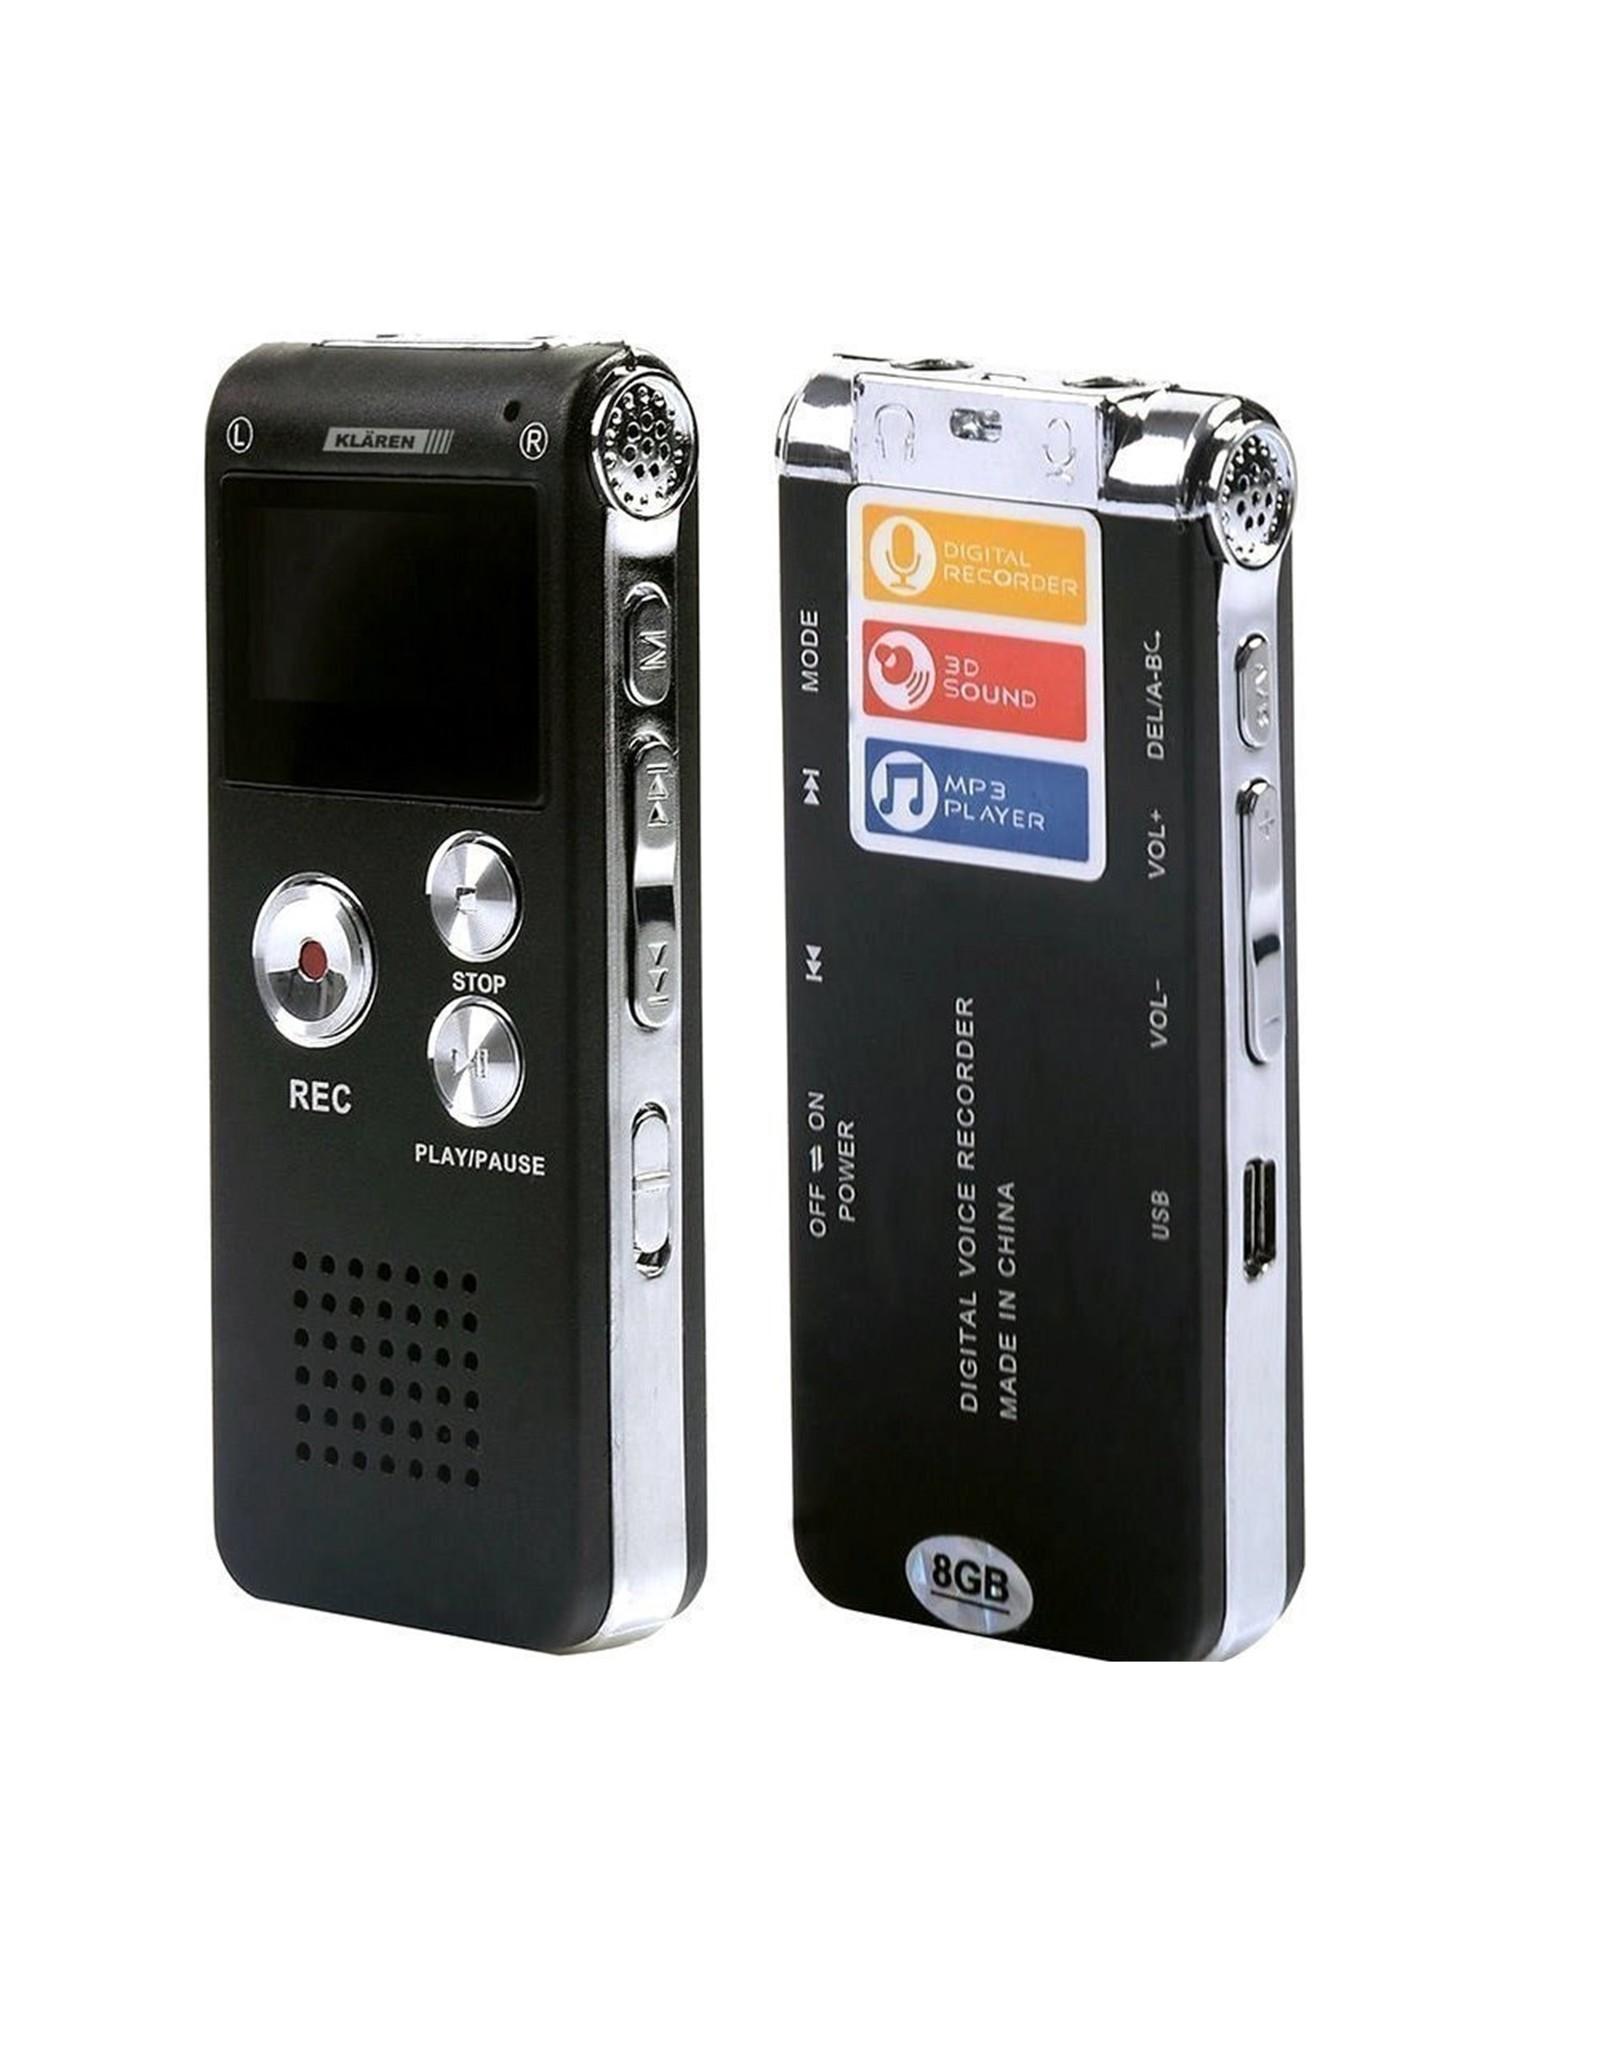 Voice Recorder Premium - Stereo Opname - Met MP3 Speler functie